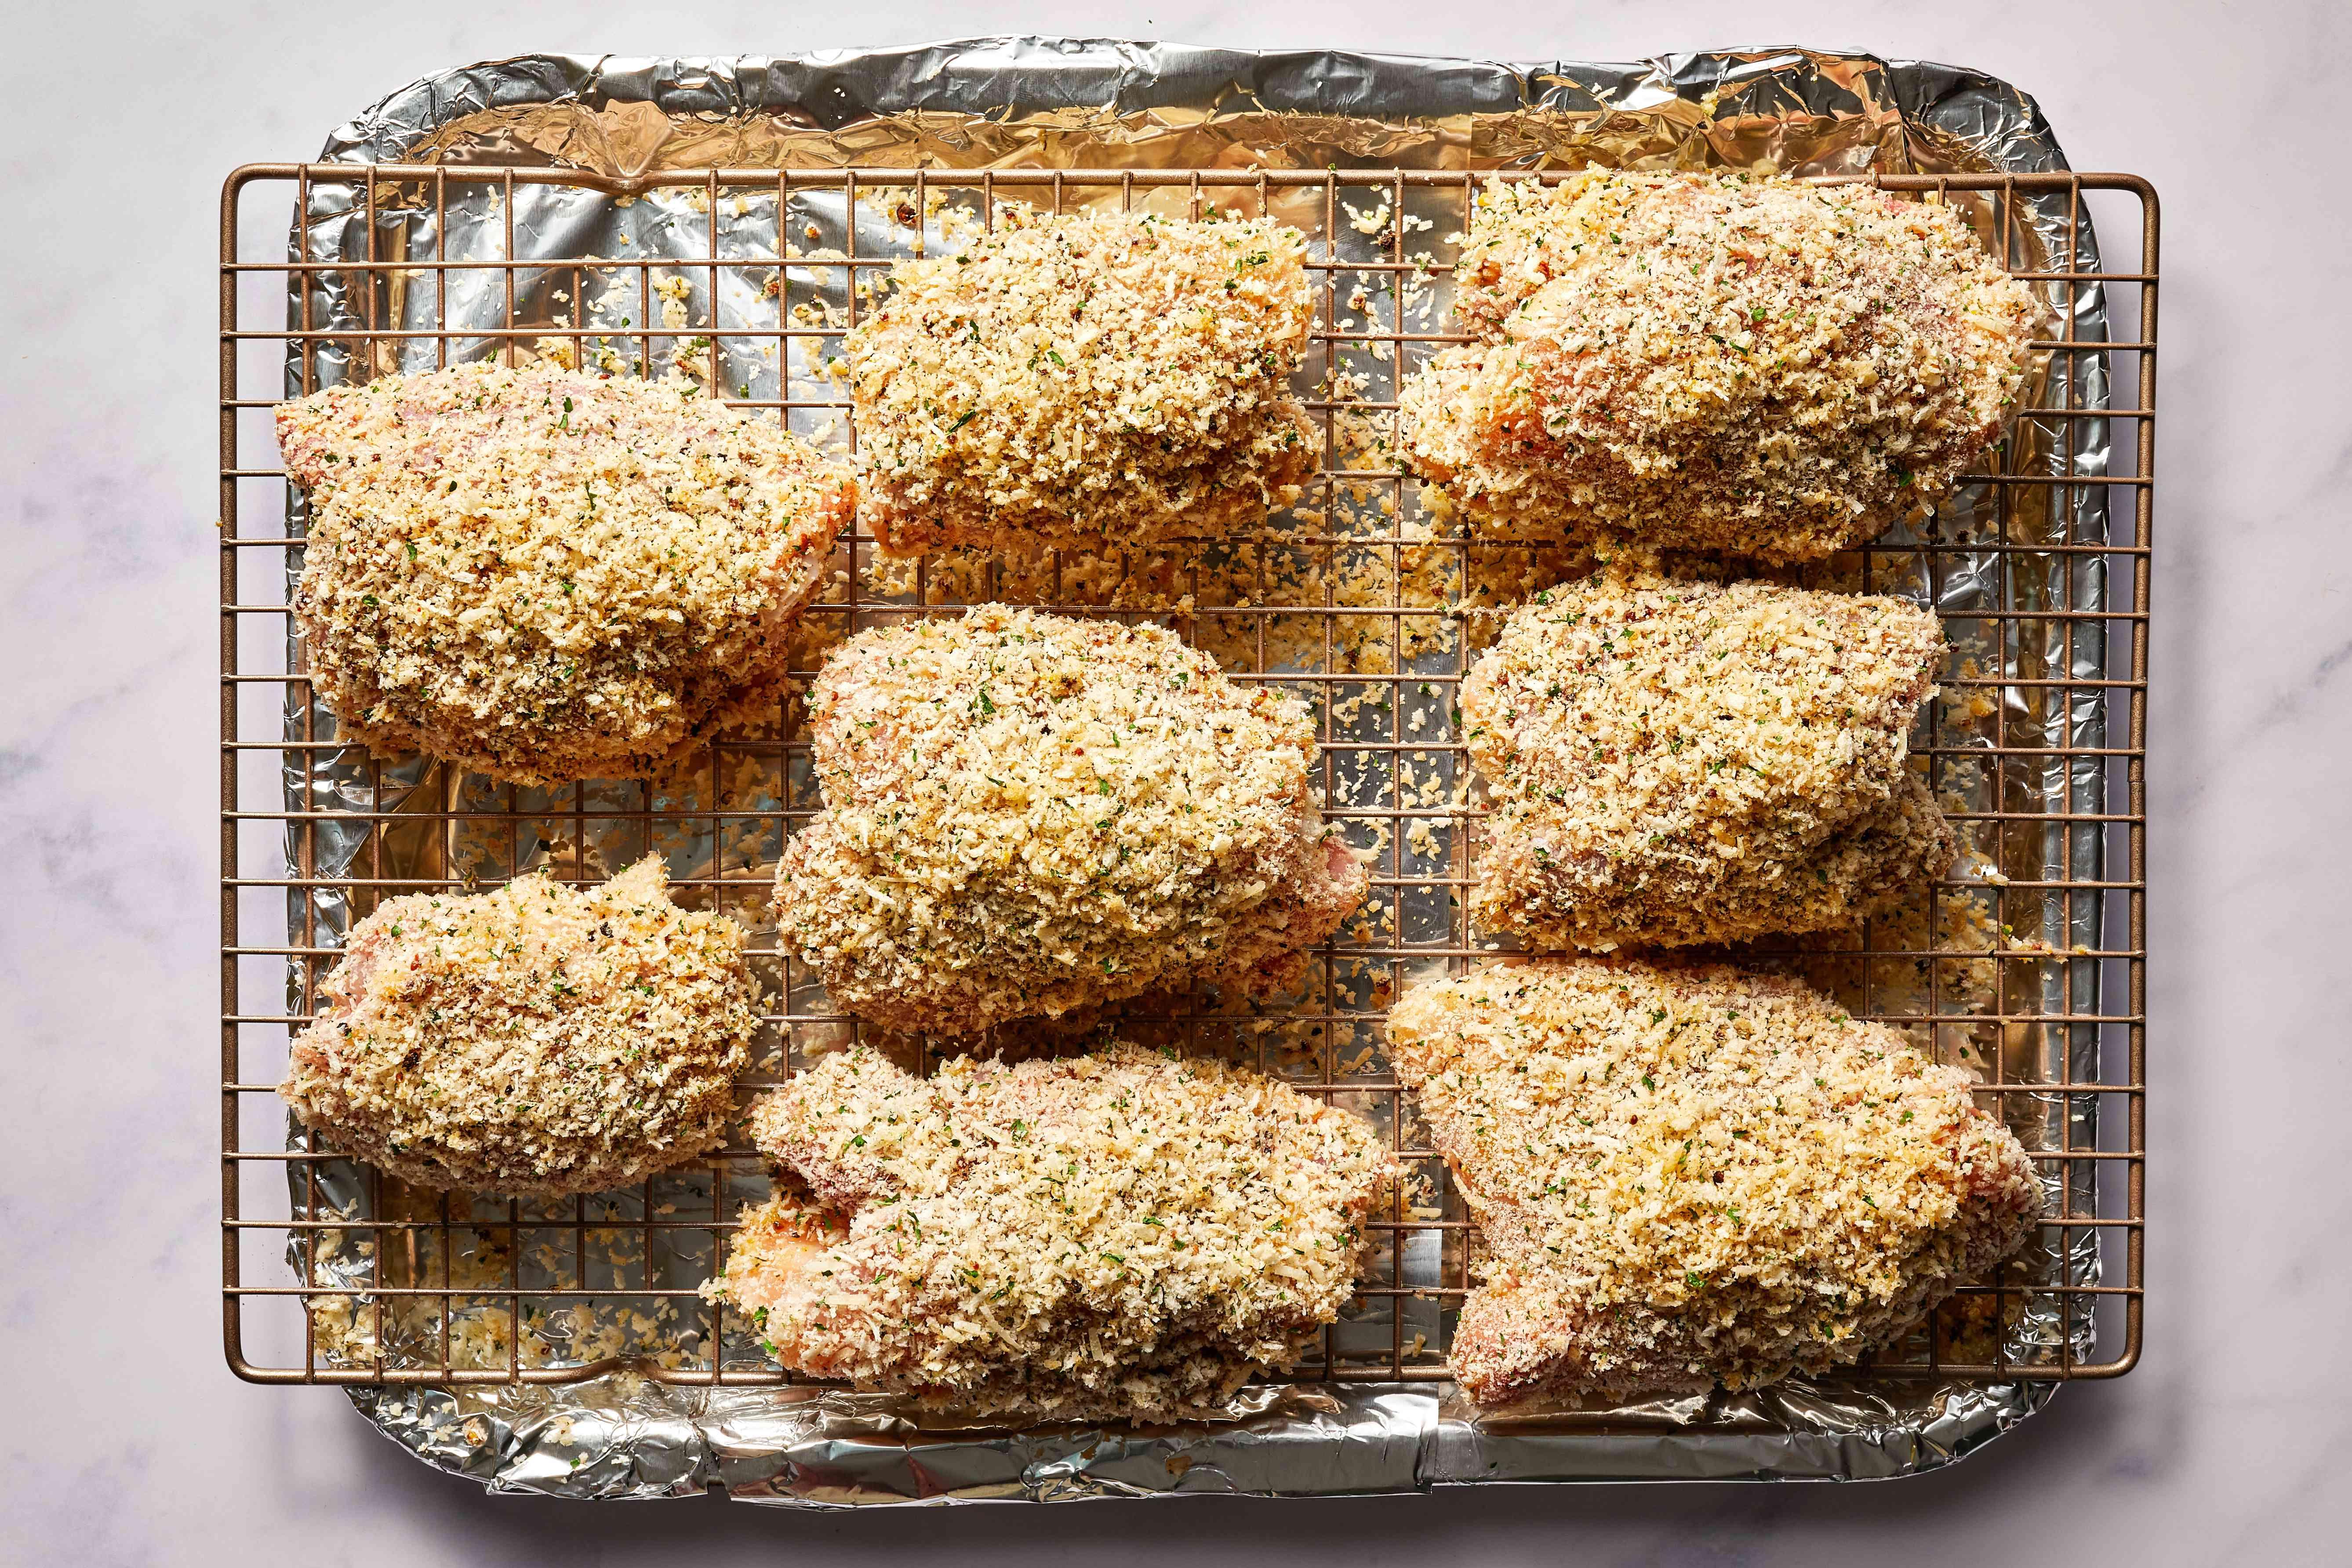 breaded chicken on a rack